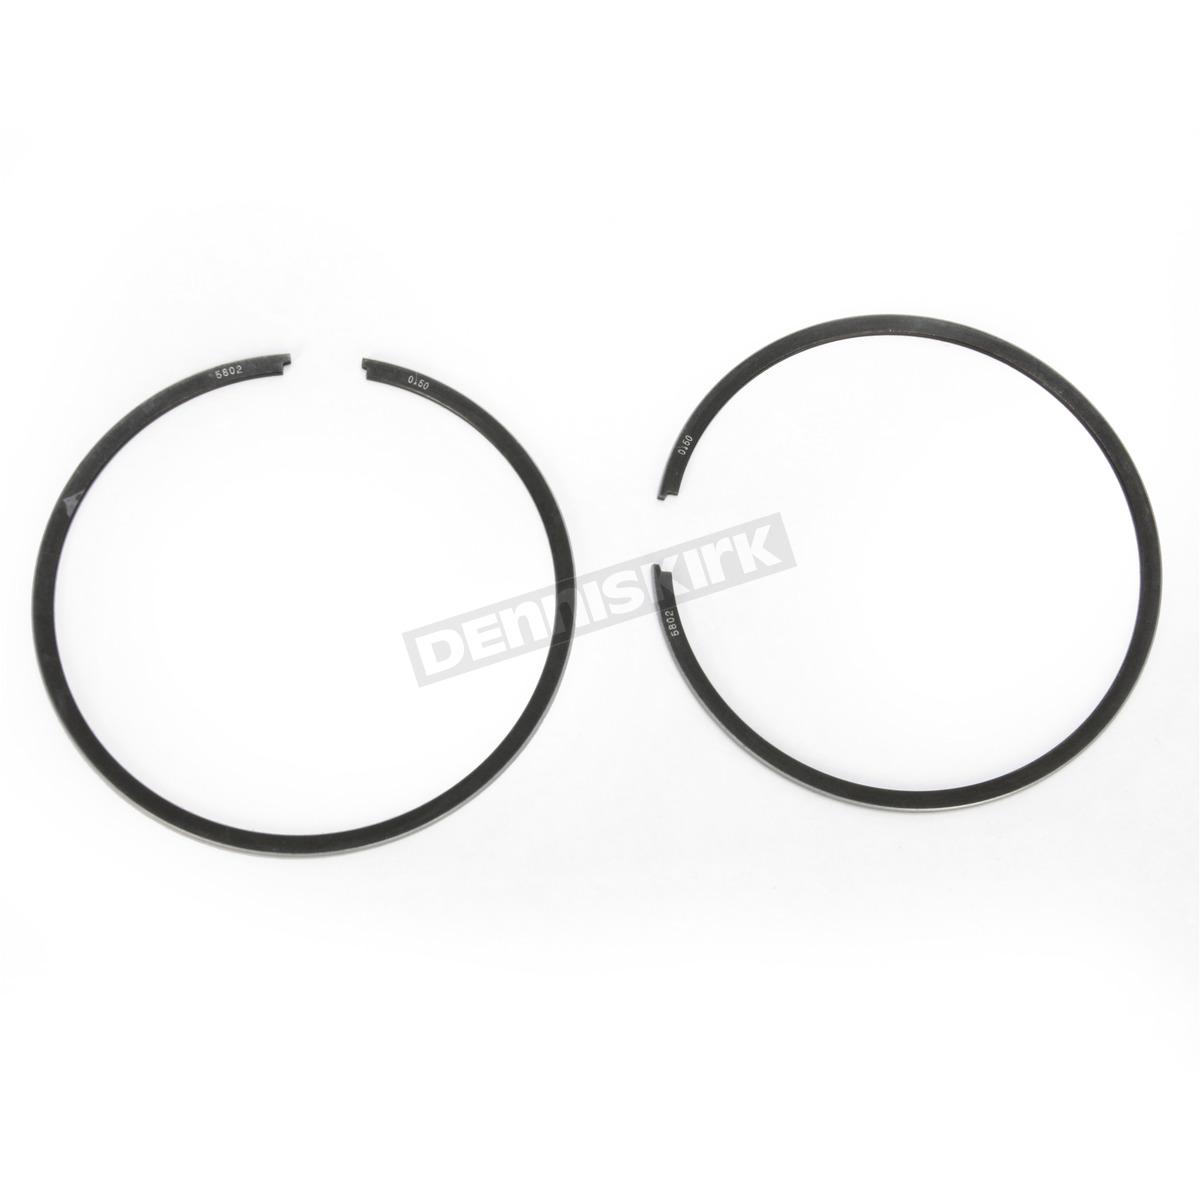 Pro X Piston Ring Set